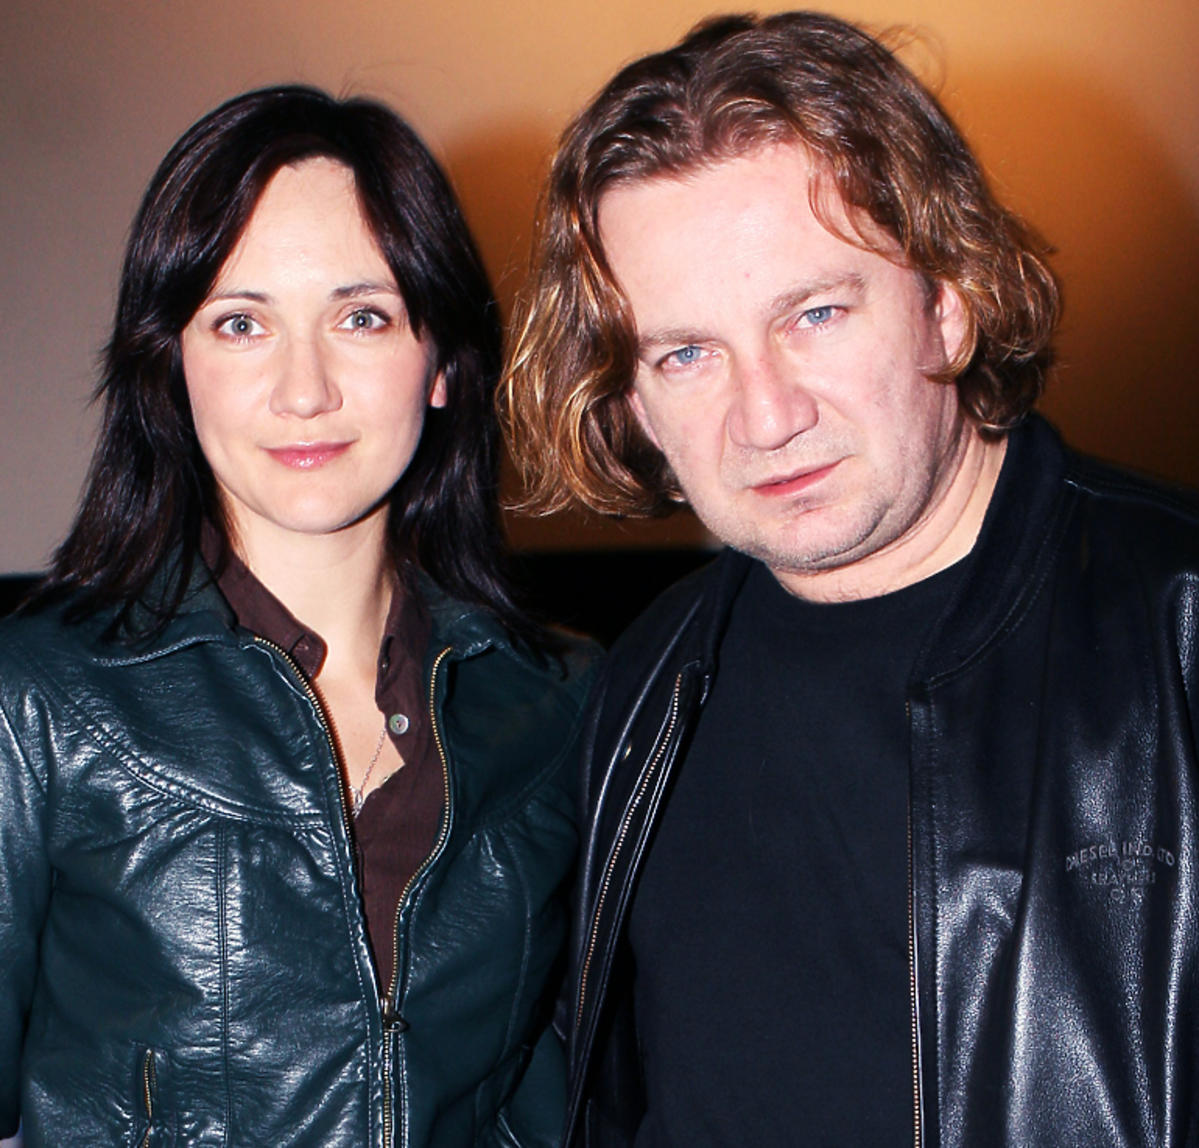 Ilona Ostrowska, Paweł Królikowski, Ranczo